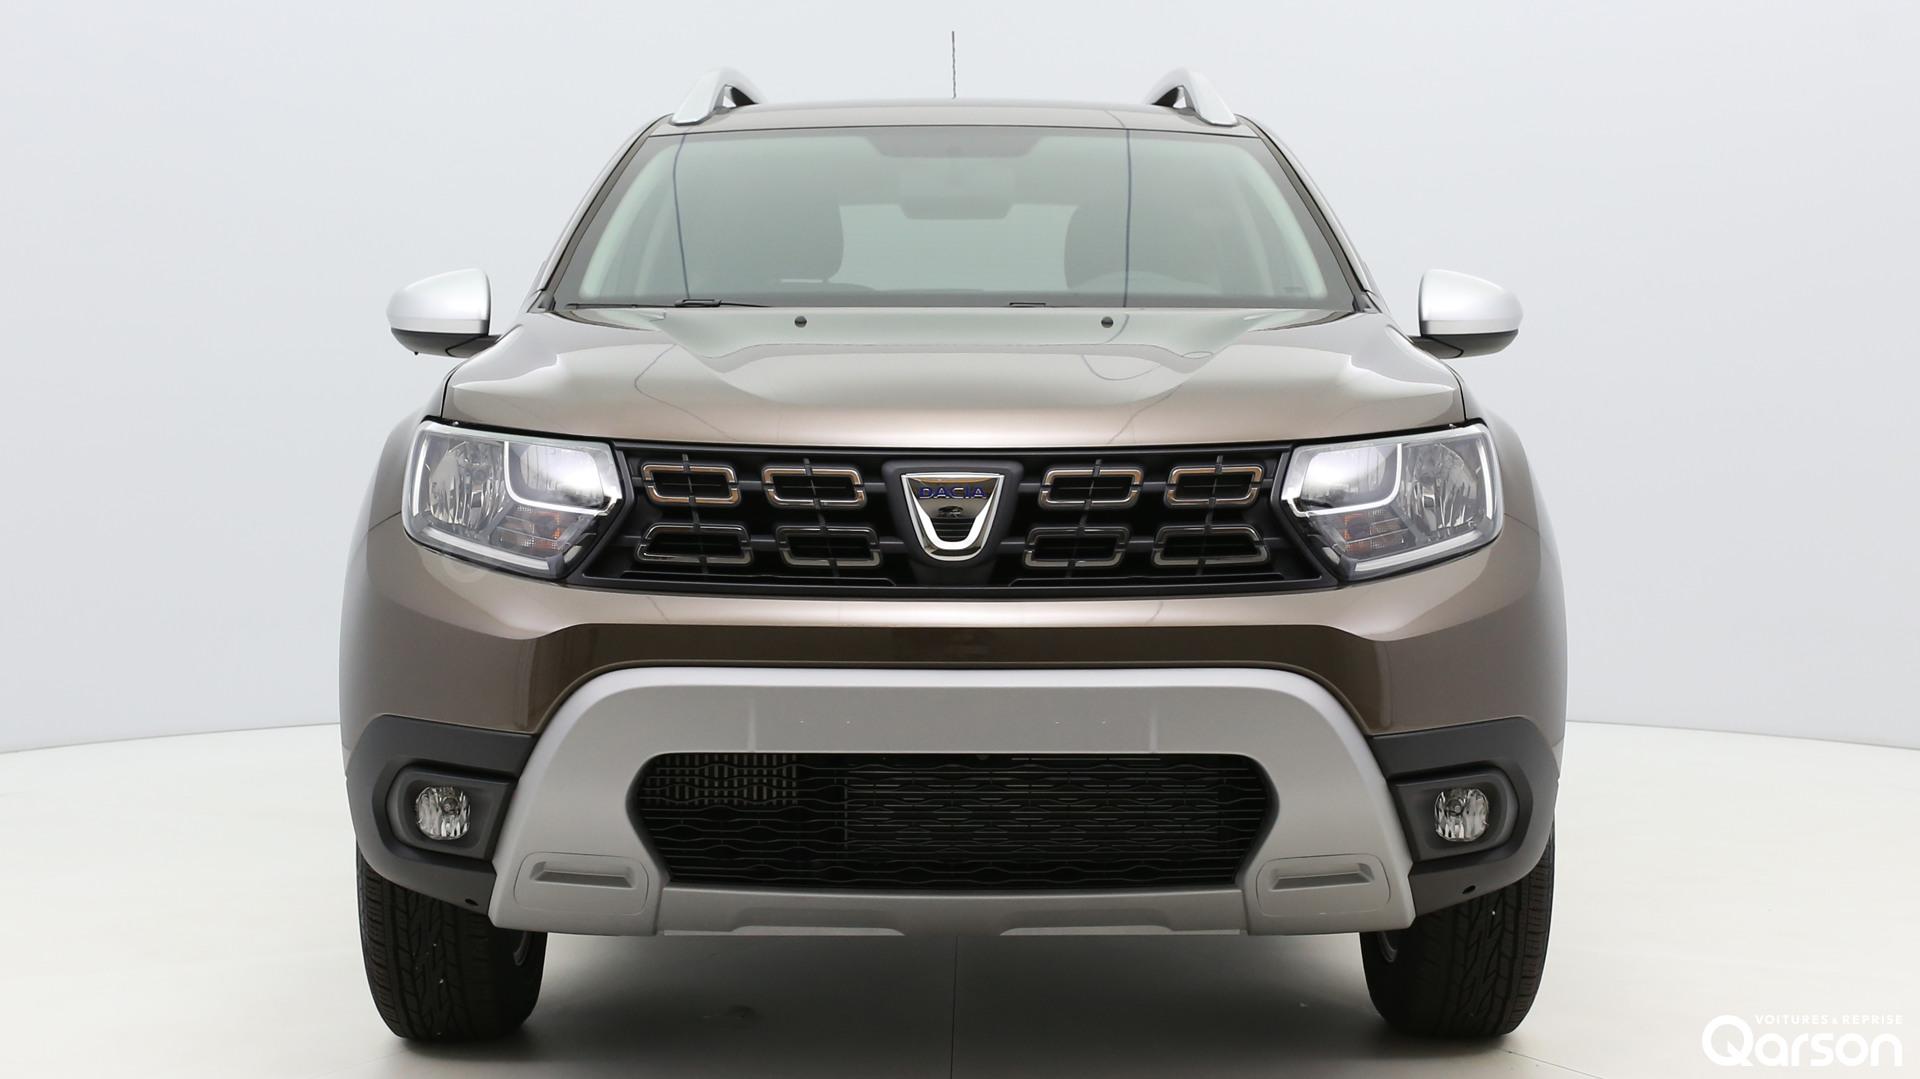 Calandre Dacia Duster